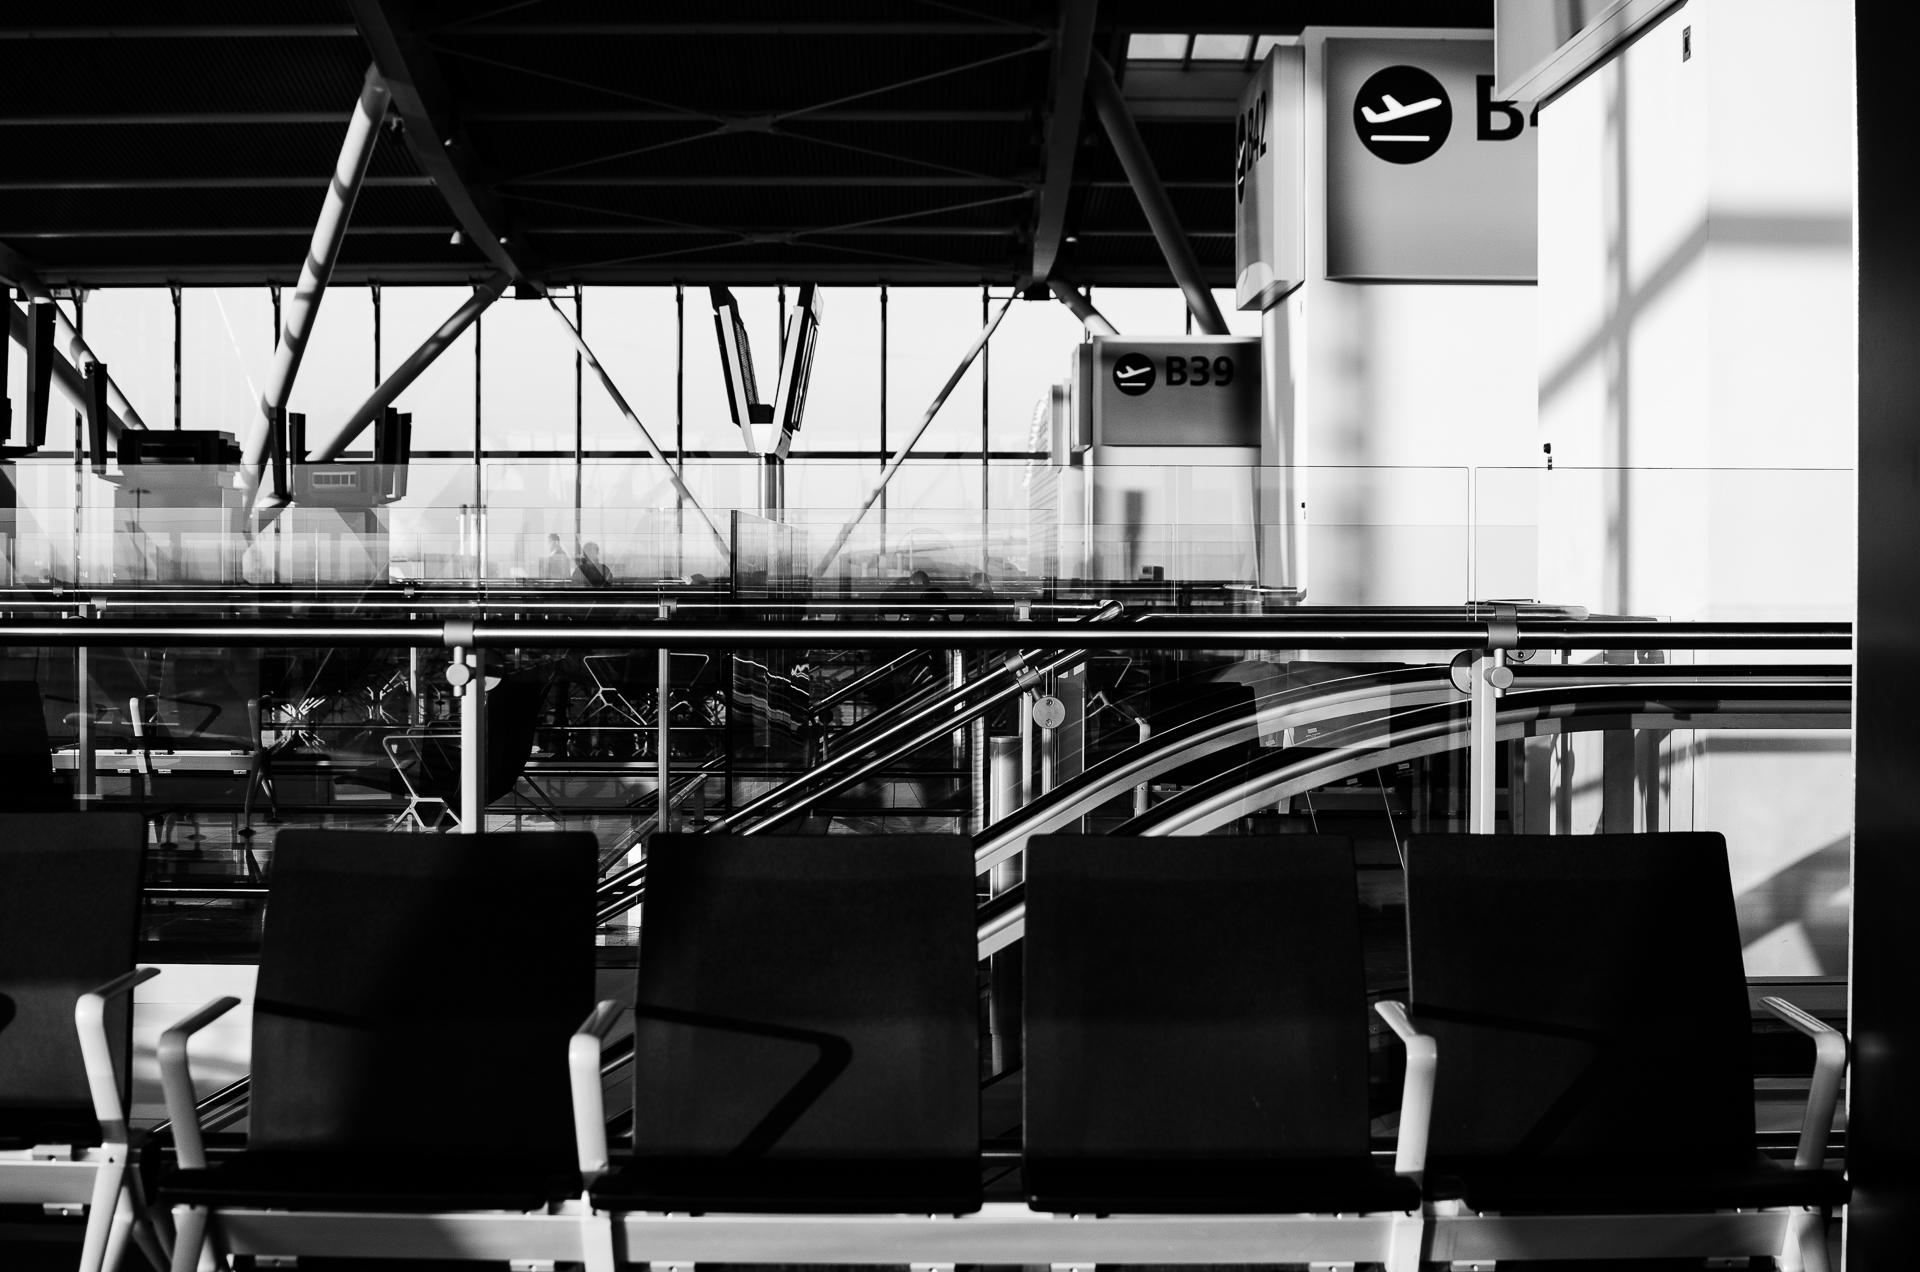 Departure gates, Heathrow T5